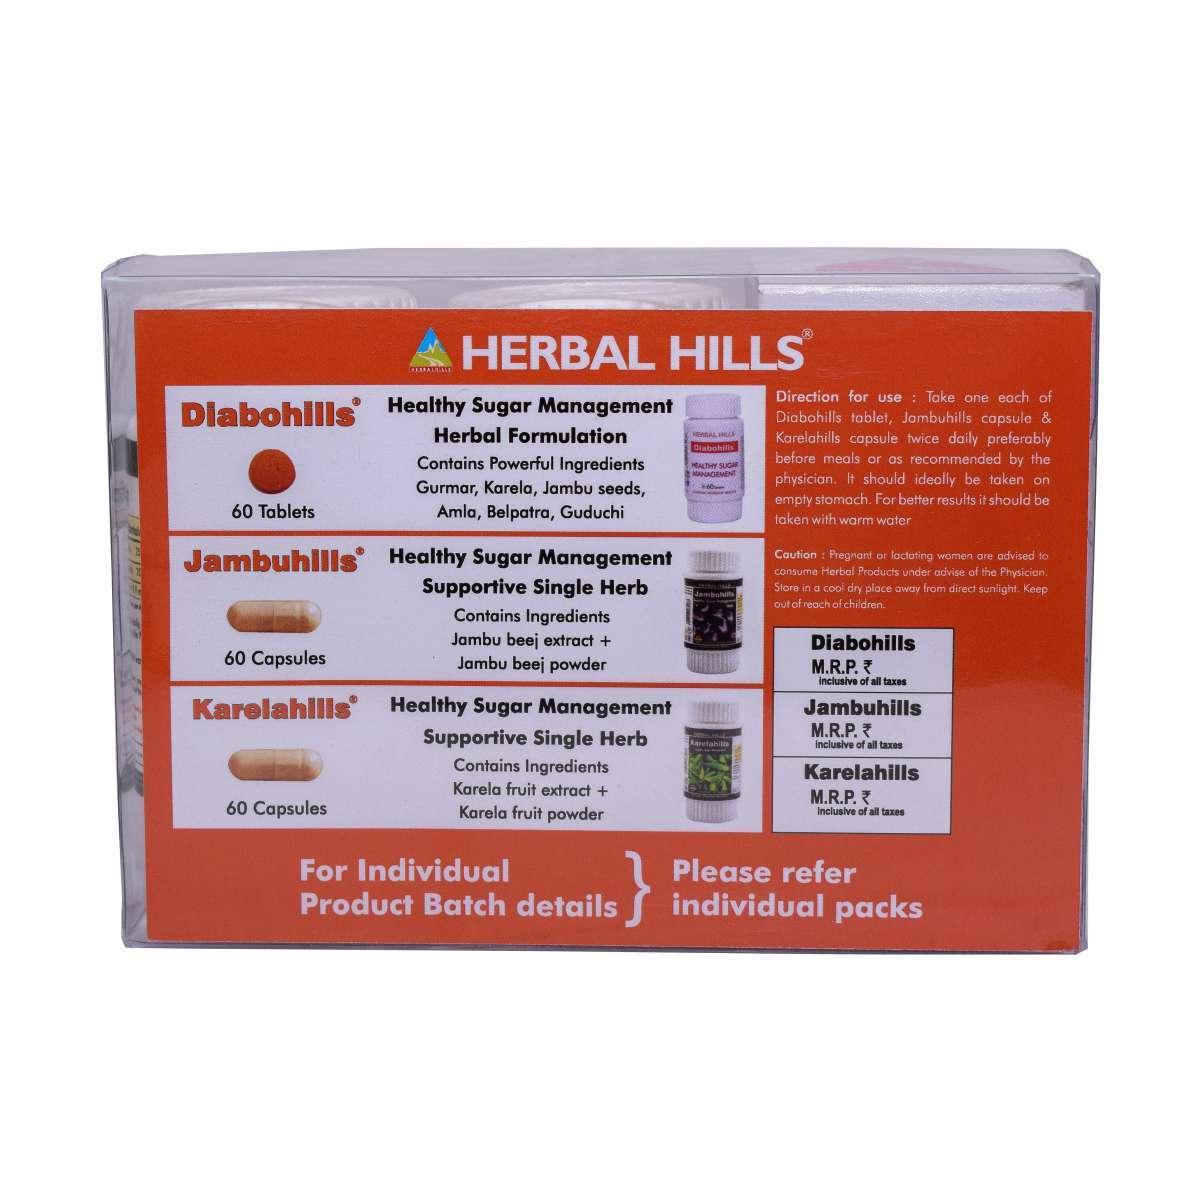 Diabohills Kit - Medicine for Liver, Diabetes & Healthy Blood Sugar